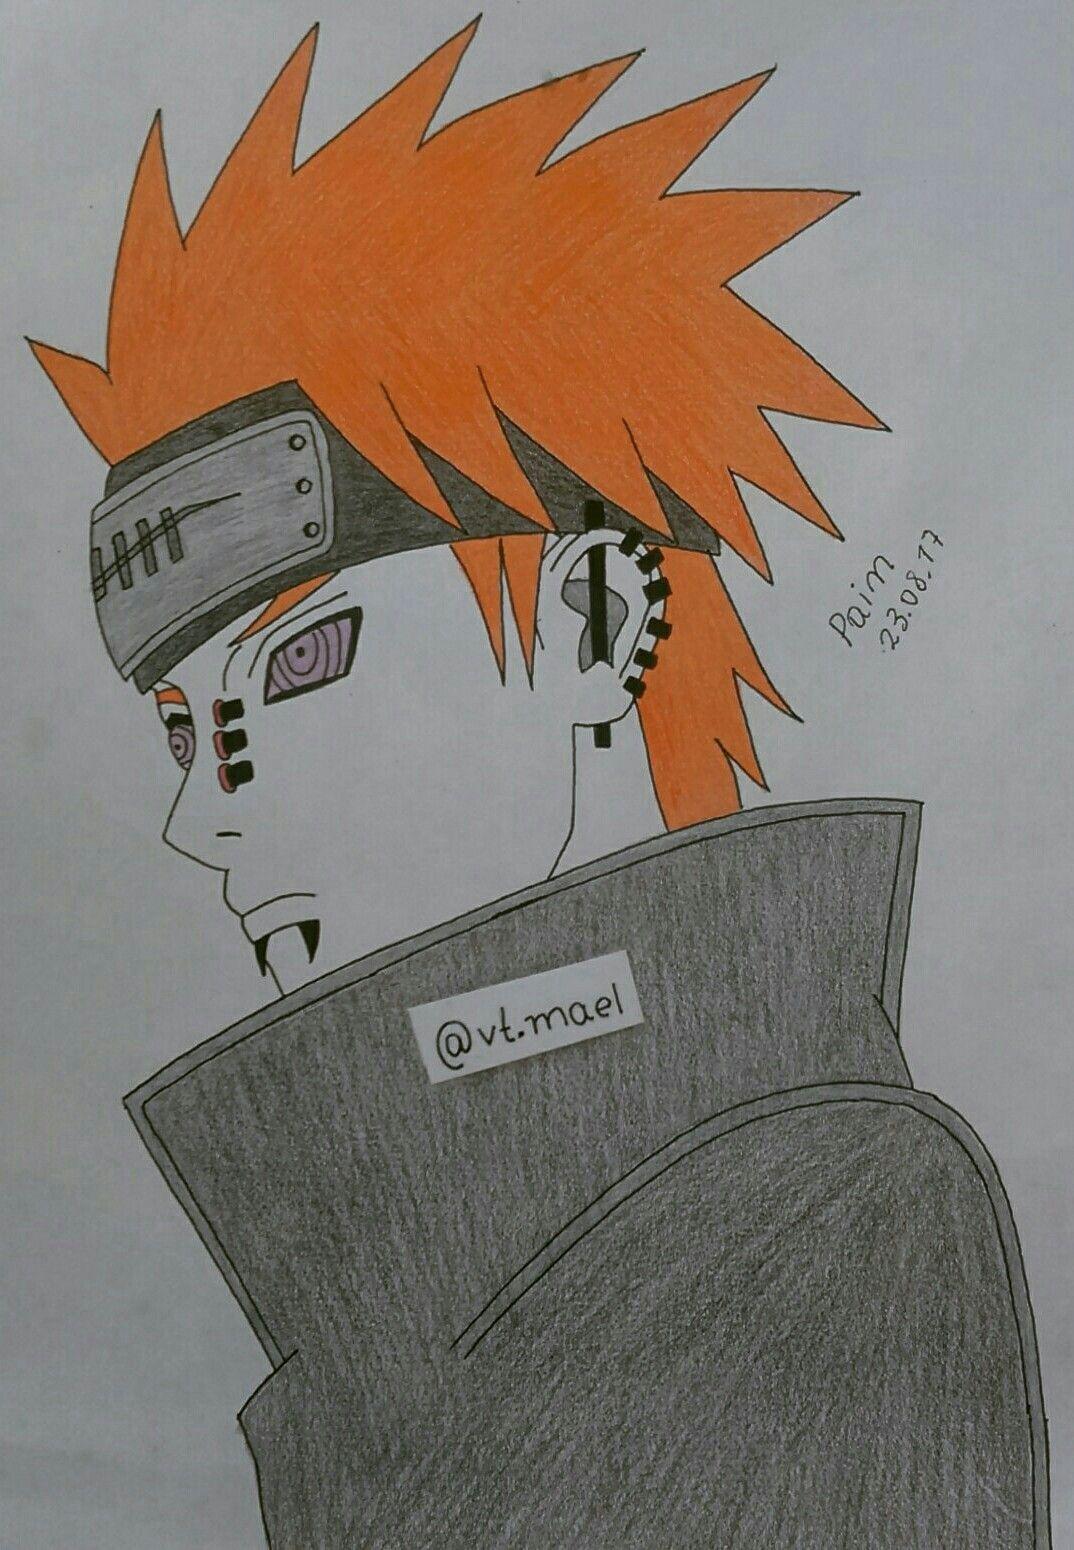 By vt mael ✍ ismael tavares 📌 pain yahiko ✒ hand drawing rinnegan akatsuki nagato naruto shippuden anime ismael tavares